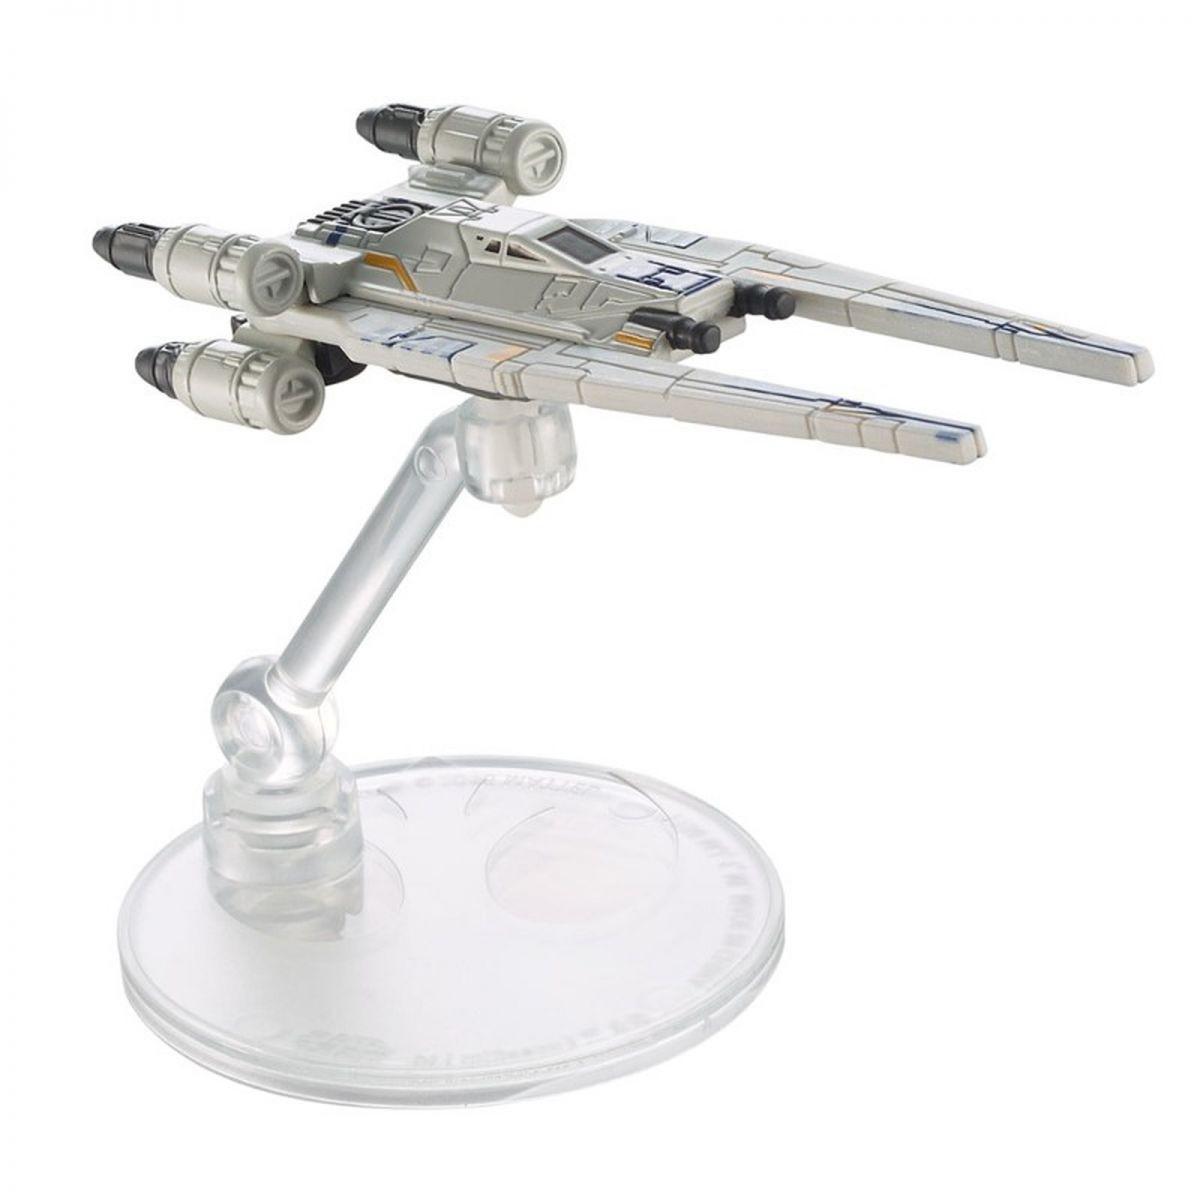 Star Wars Rogue One: Rebel U-Wing Fighter - Hot Wheels